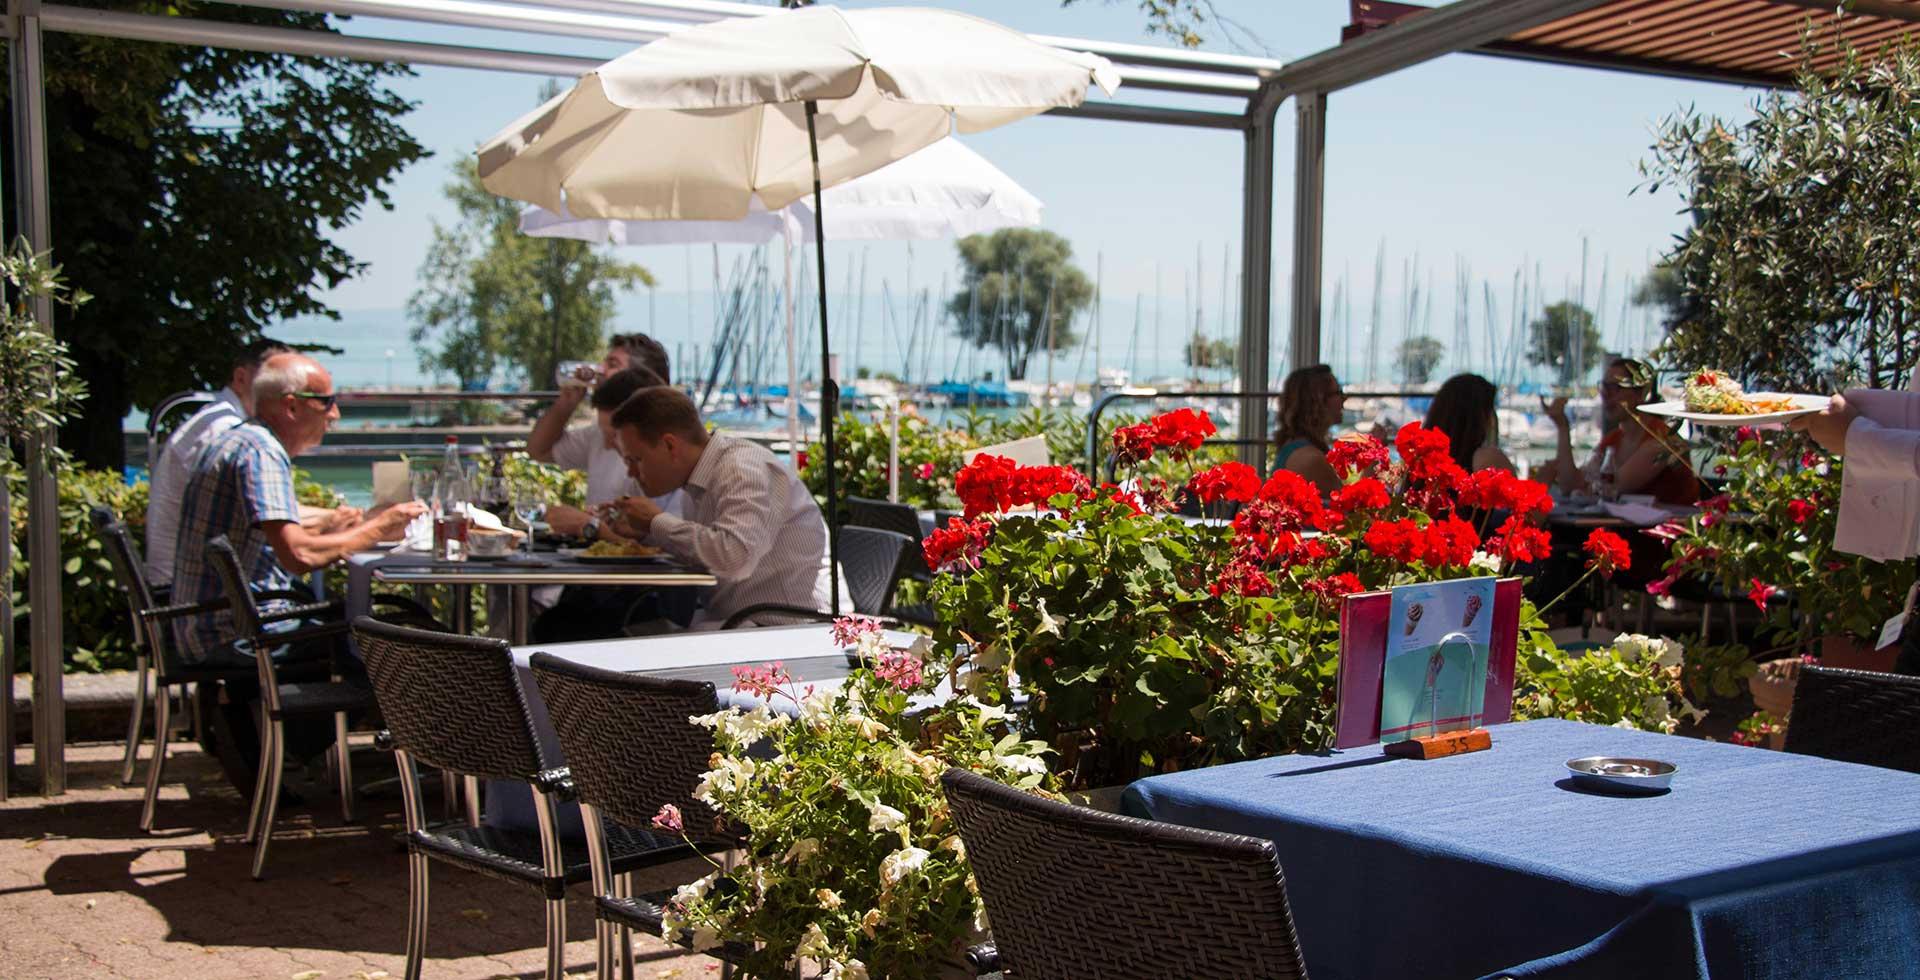 Slide Start Terrasse-See-Park-Hotel Inseli-MG_0229-1920x980